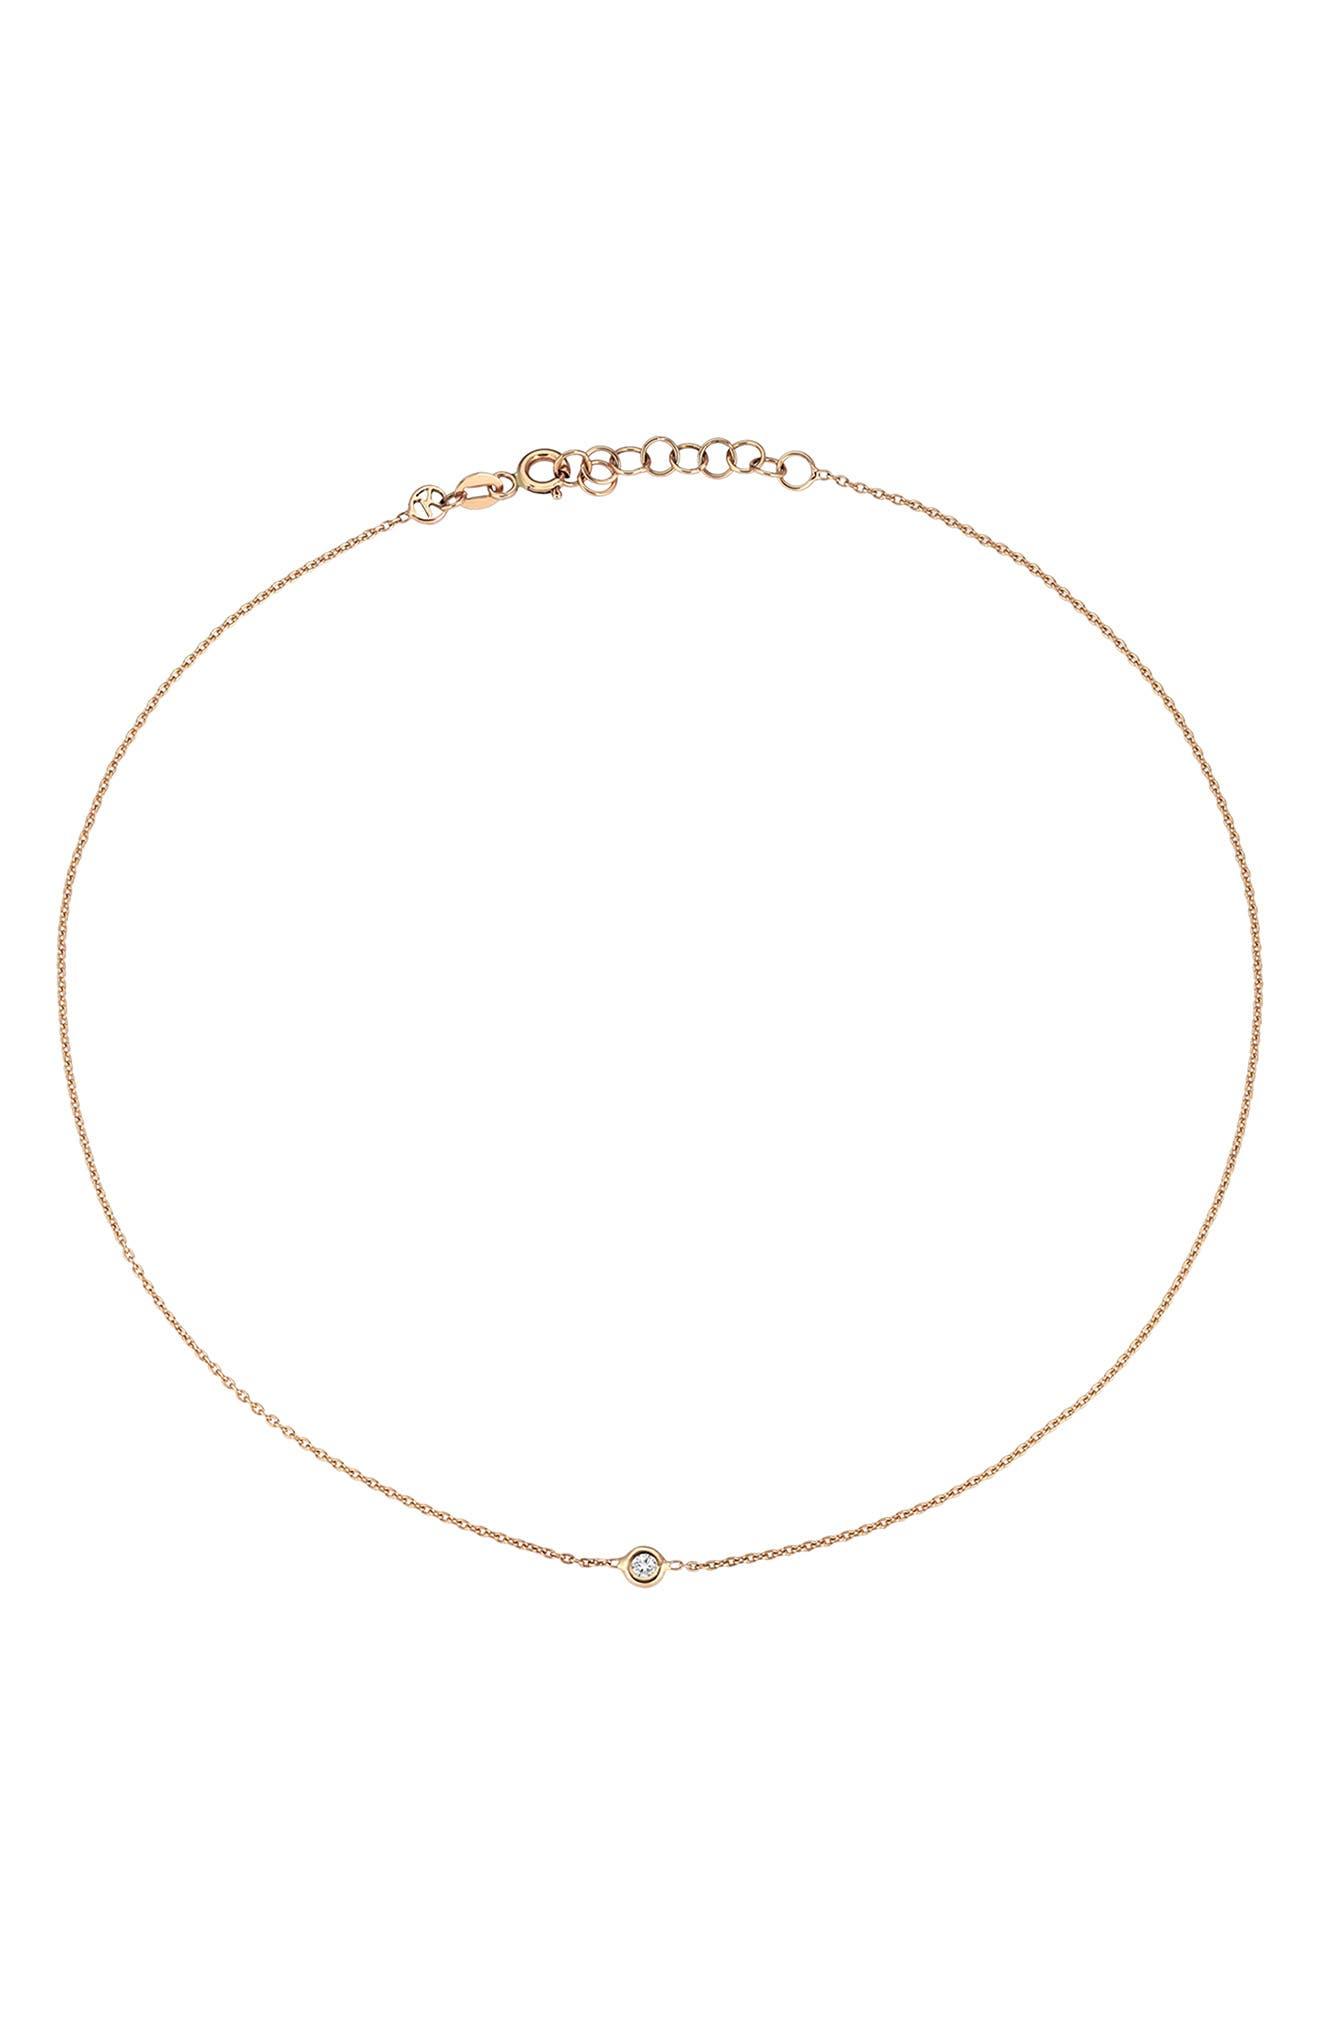 Diamond Choker Necklace,                             Alternate thumbnail 3, color,                             ROSE GOLD